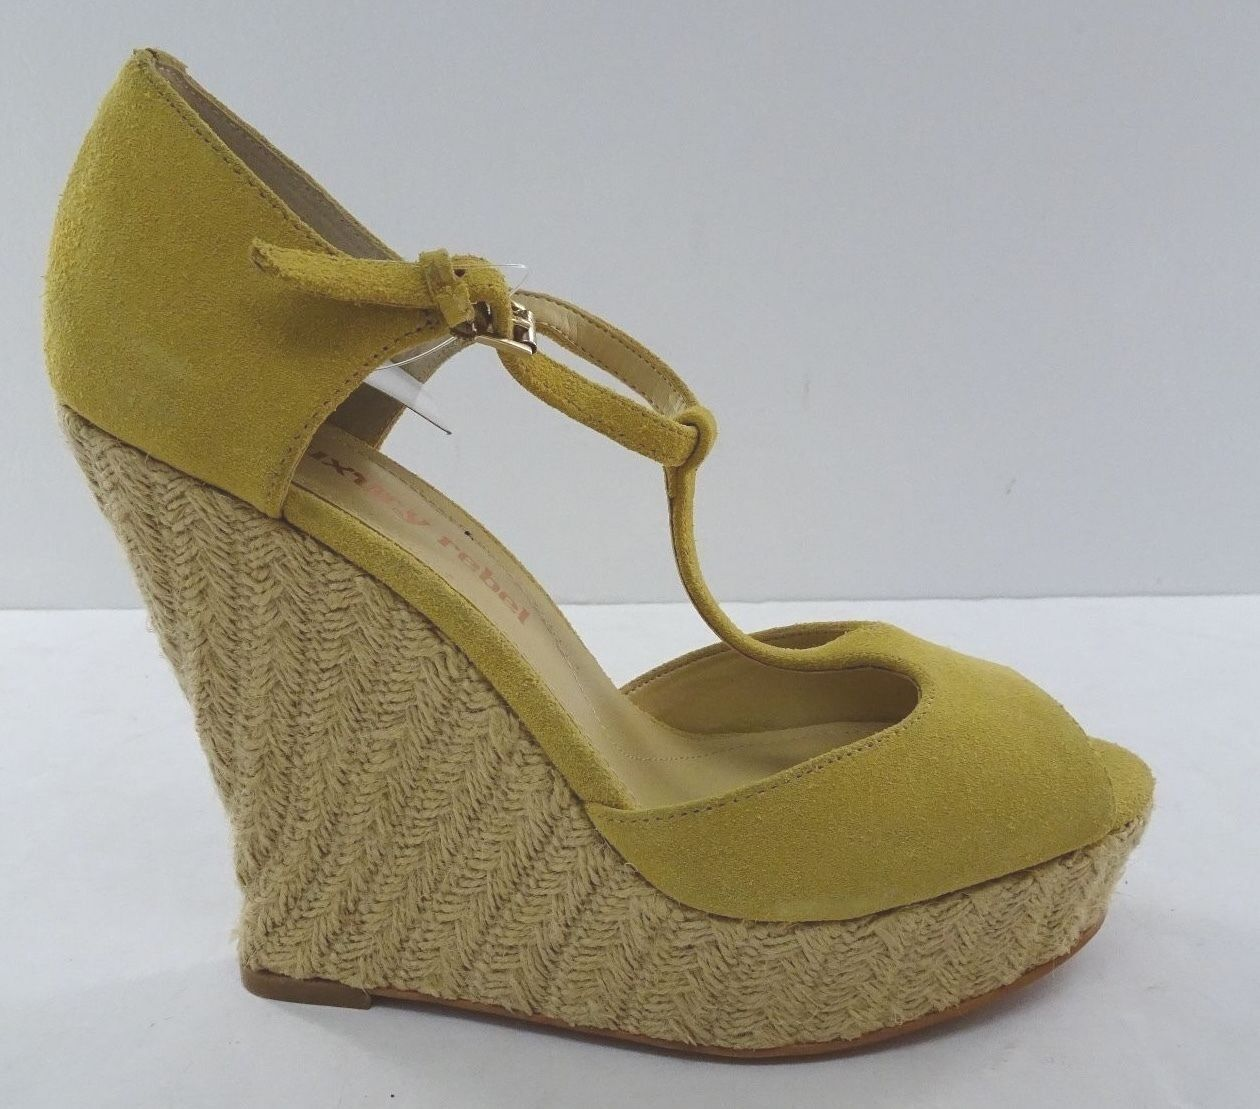 NWD - Womens Luxury Rebel  - Mustard Suede -  US Size 9 - 9.5 -